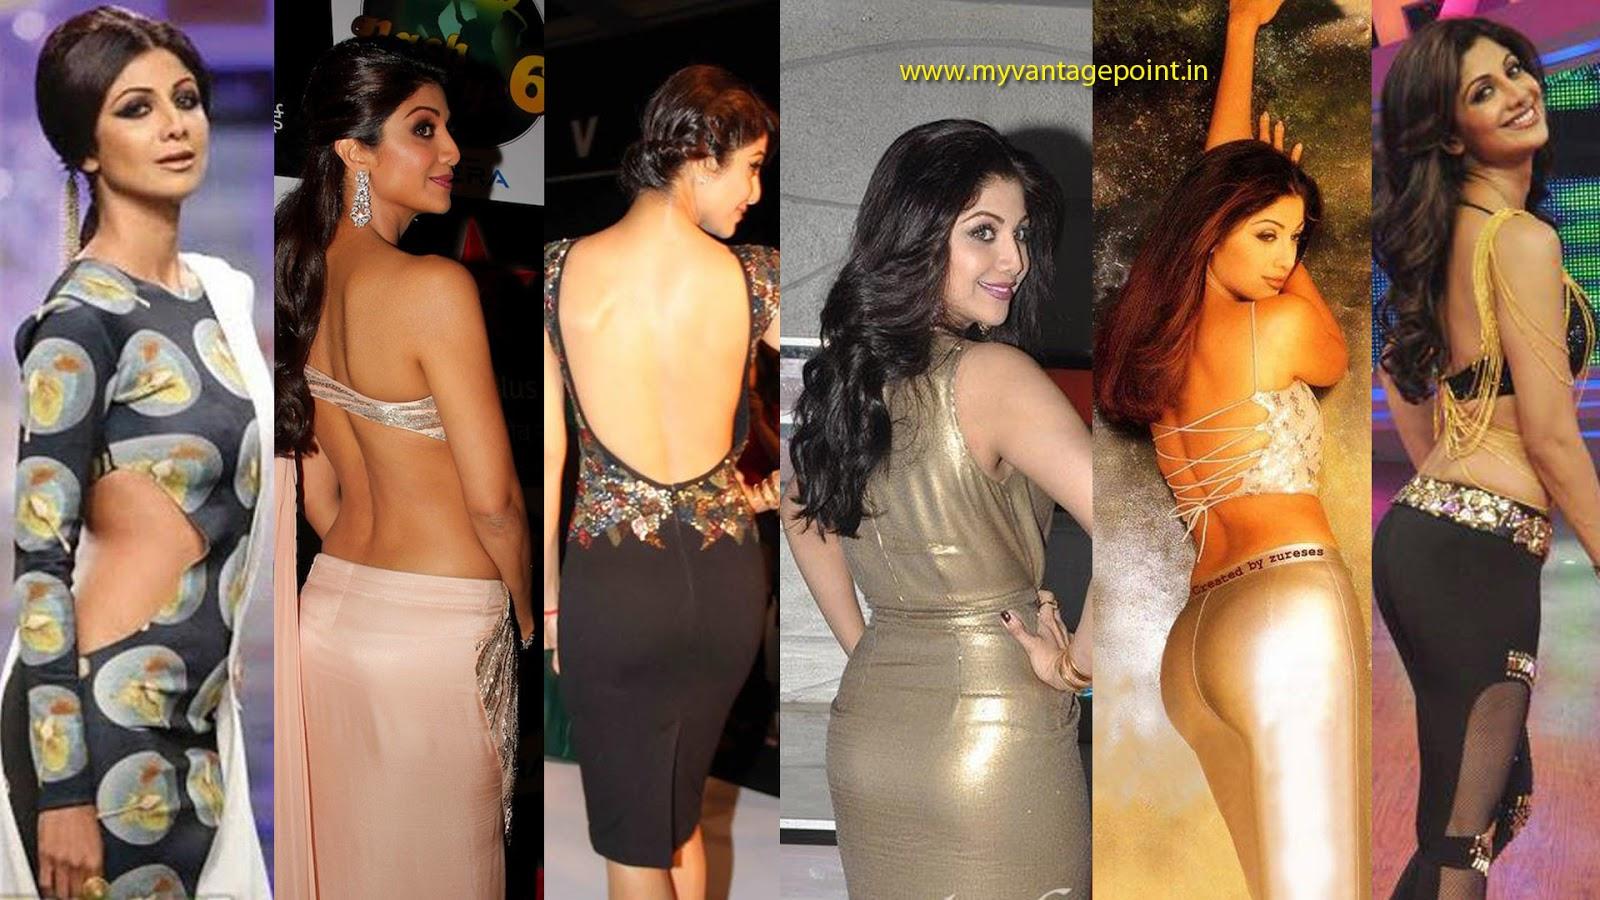 Shilpa Shetty hot, Shilpa Shetty sexy, Shilpa Shetty HD wallpaper, Shilpa Shetty Spicy Photos, Shilpa Shetty backless, Shilpa Shetty sexy back, Shilpa Shetty backshow, Shilpa Shetty thunder thighs, Shilpa Shetty in tight dress, Shilpa Shetty in short dress, Shilpa Shetty best hot HD wallpaper